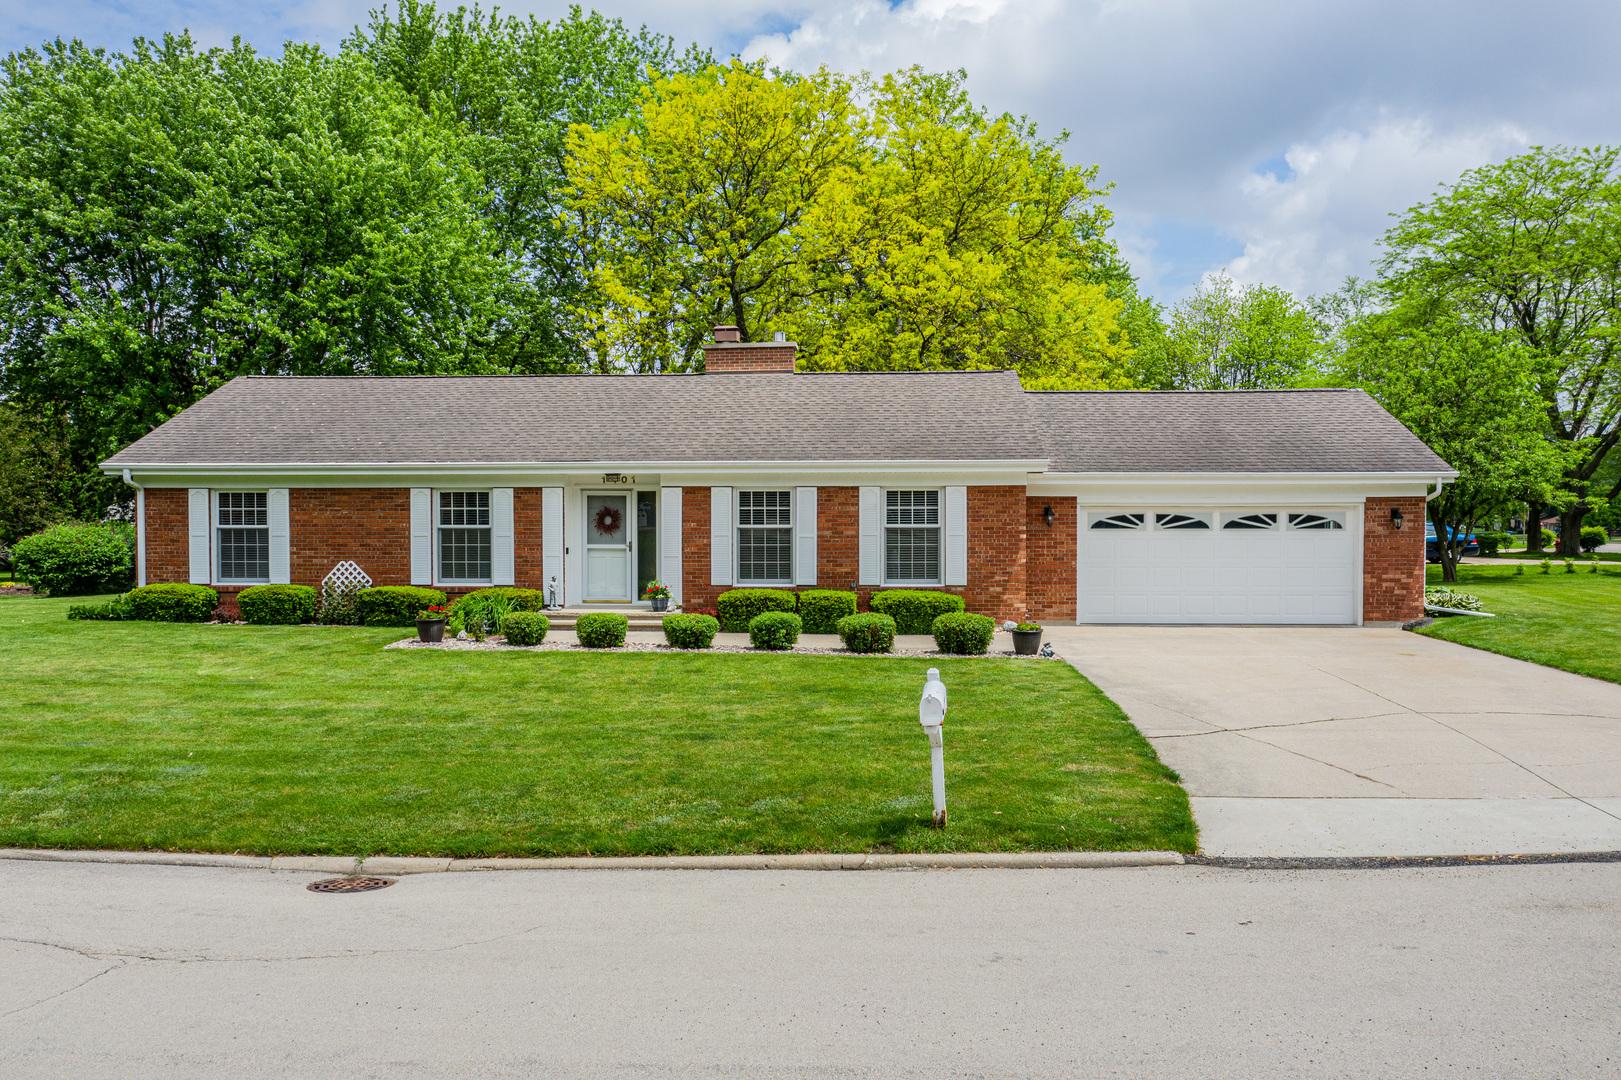 1401 Hillcrest, Mendota, Illinois, 61342